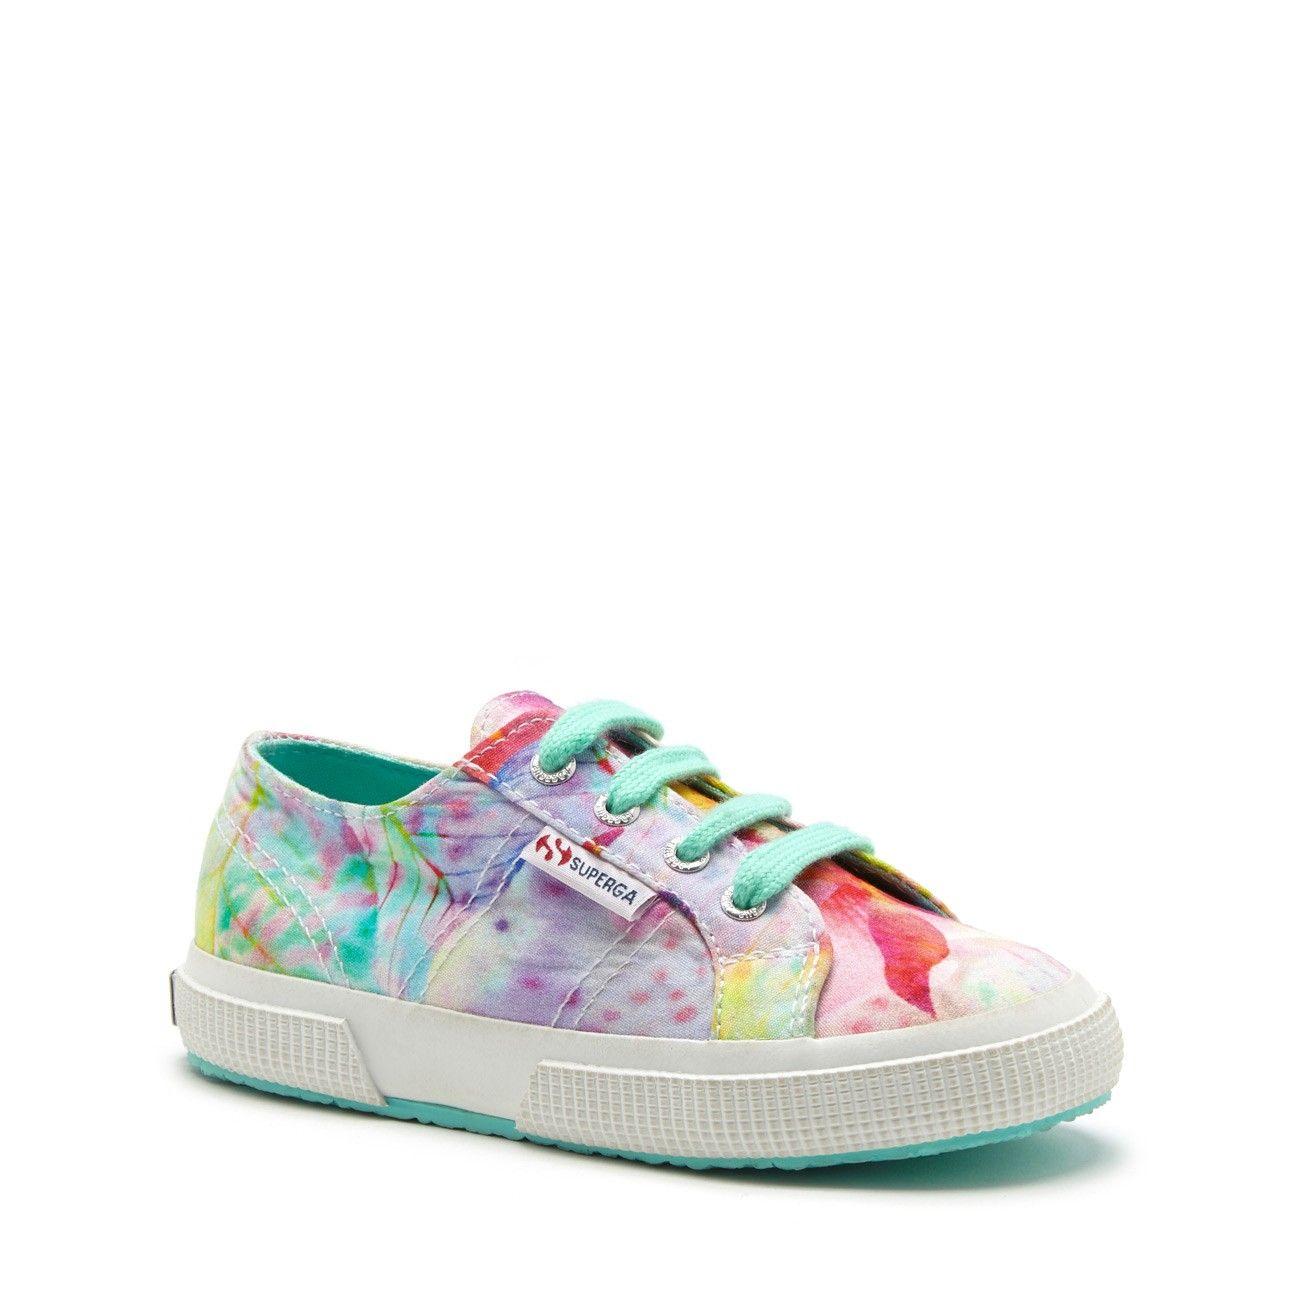 Fus Multi Canvas Sneaker | 2750 FabricJ Bahamas | Free Shipping on Orders $30+